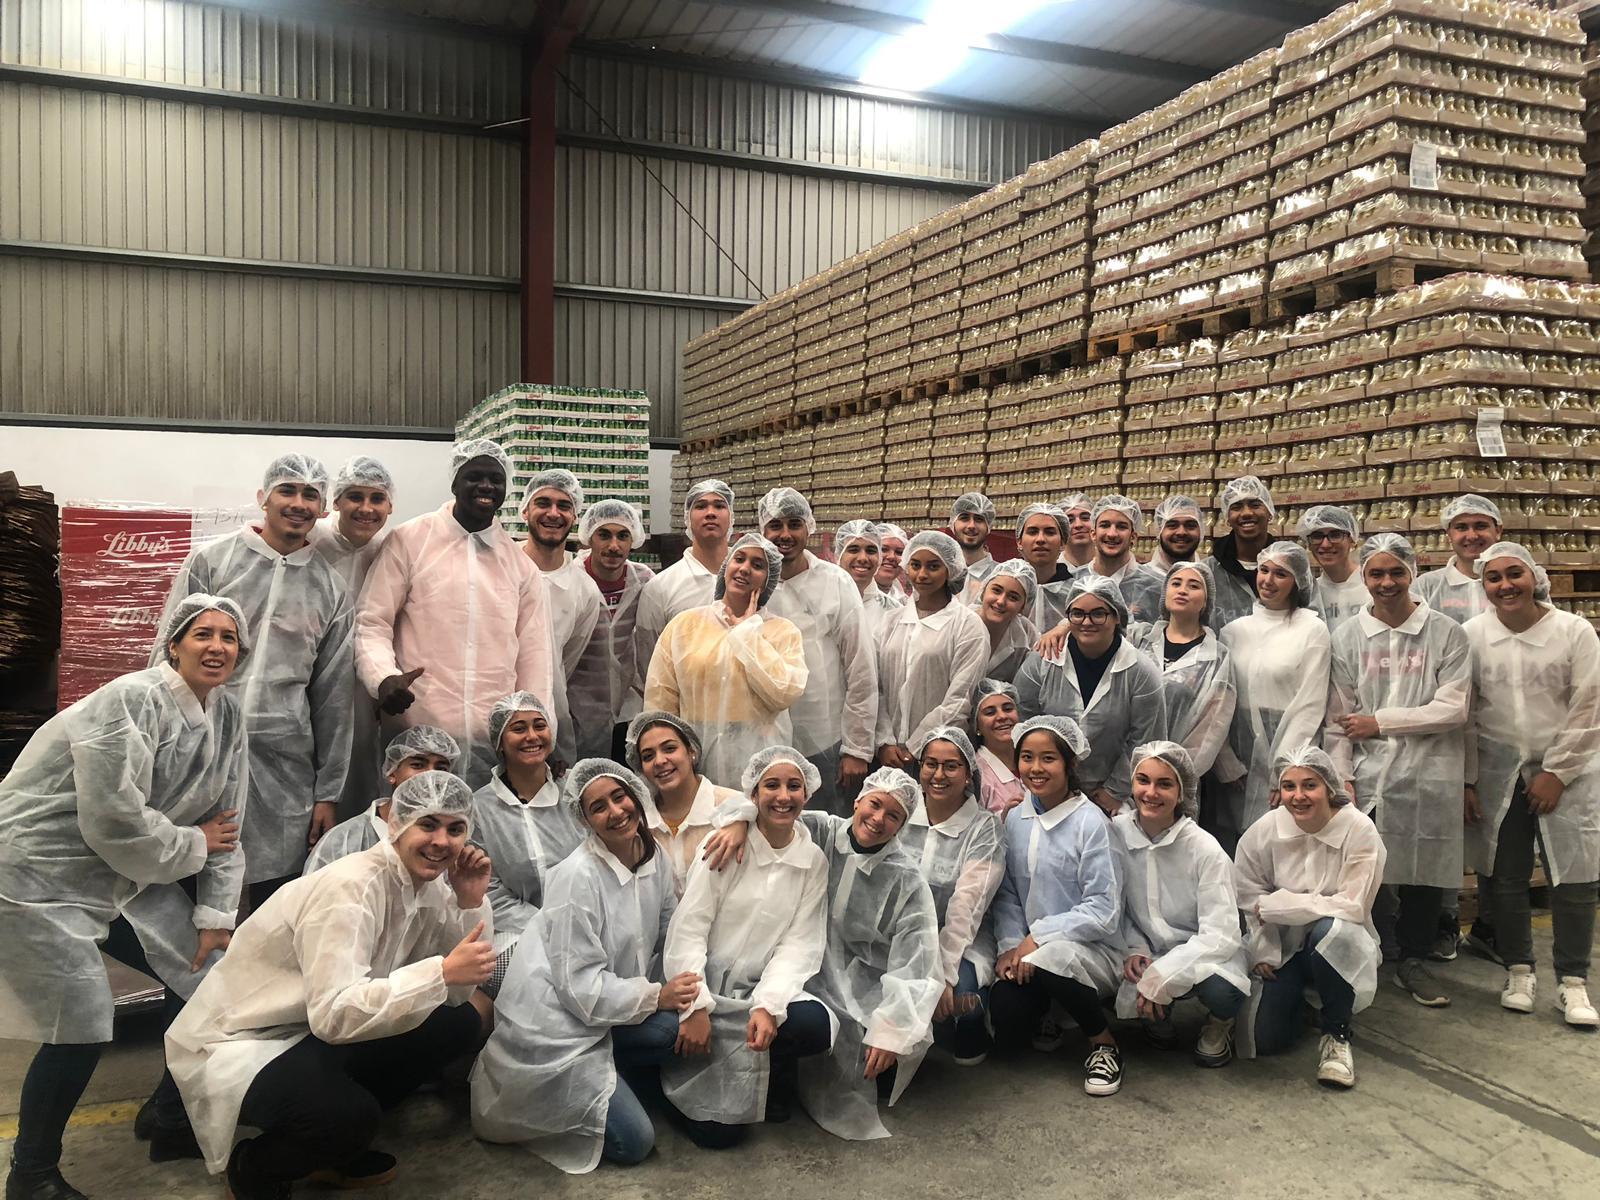 Visita a la empresa Libbys Canarias